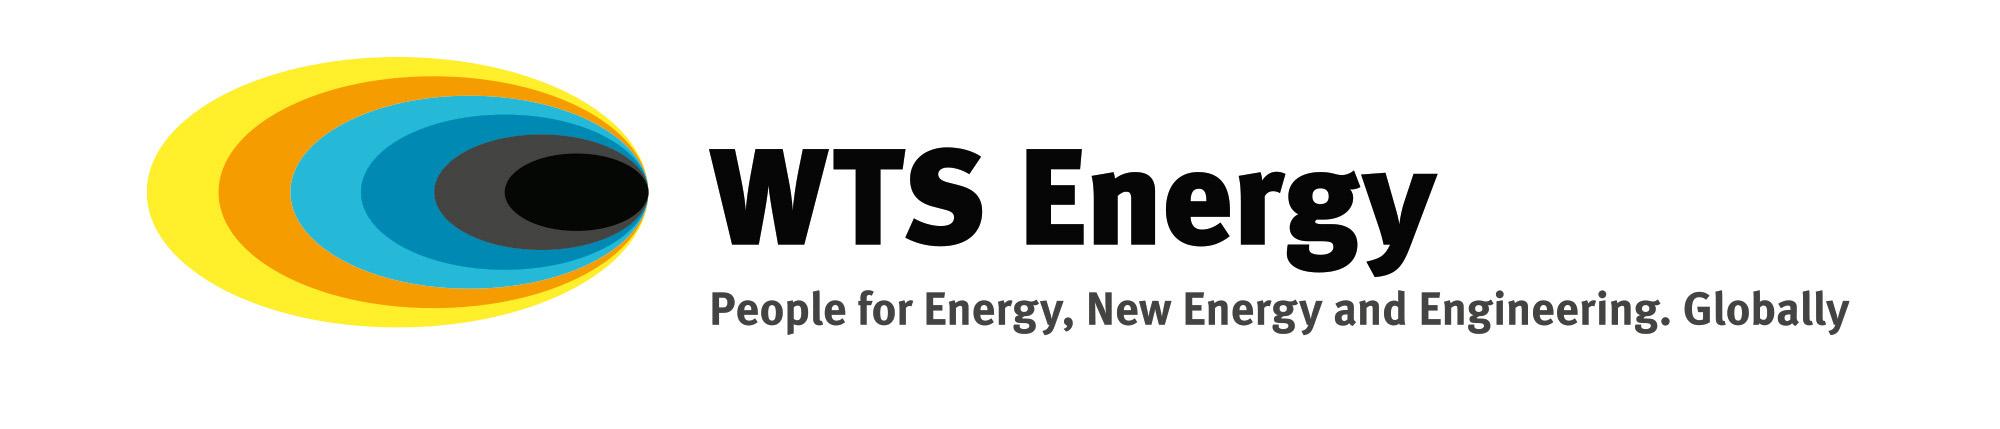 WTS Energy - logo